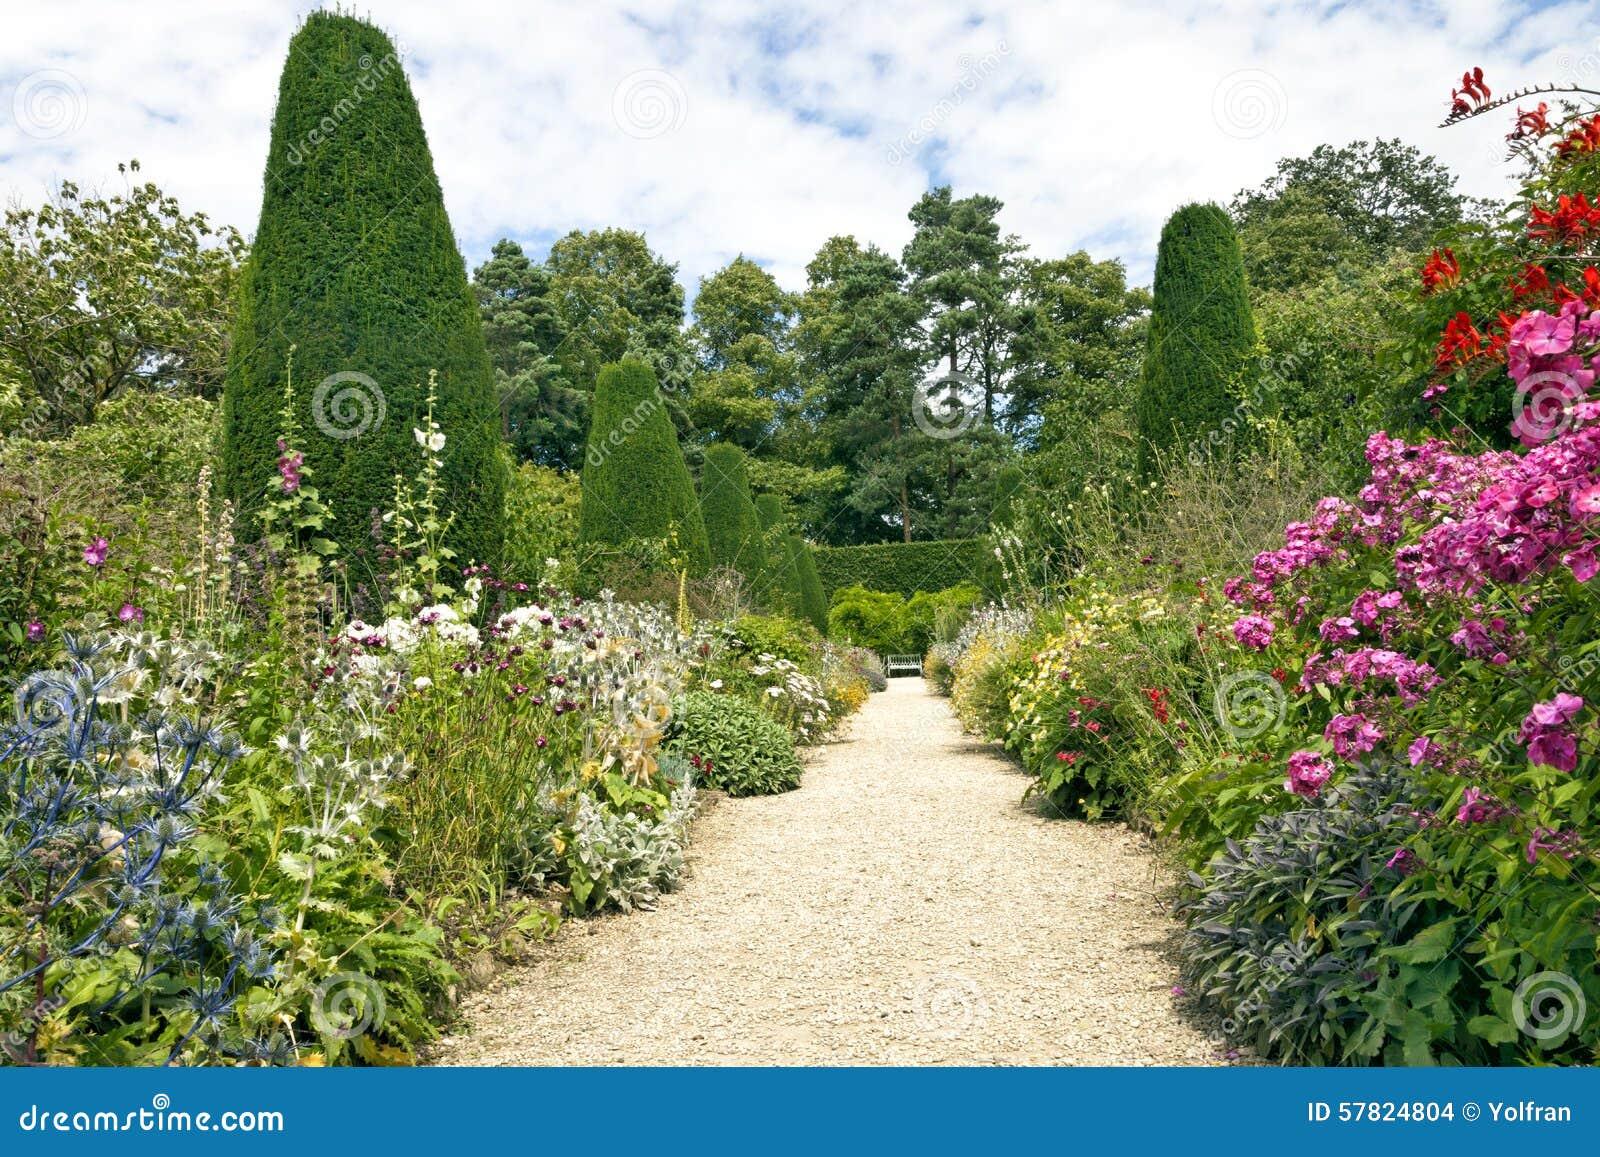 Garden Stone Pathway Summer Flowers In Bloom Conifers